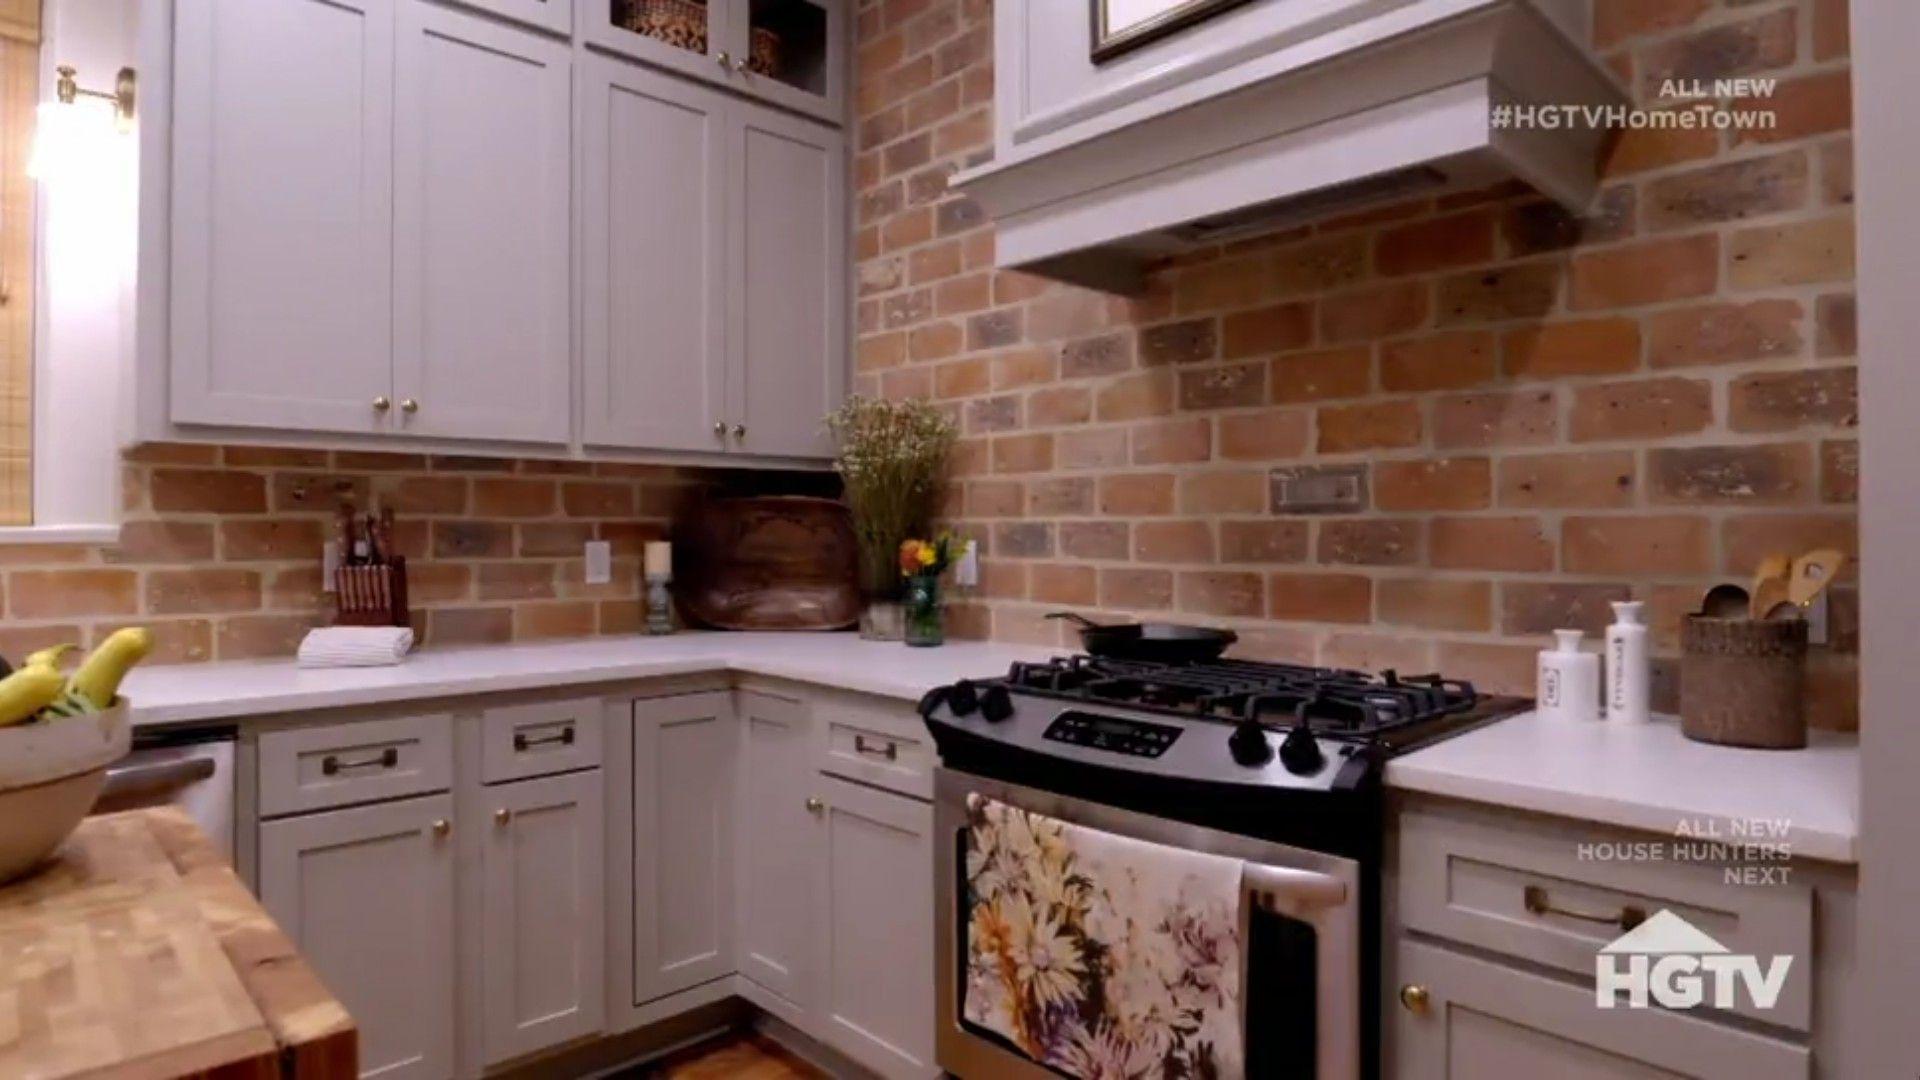 Hgtv Hometown Season 2 Episode 8 Kitchen With Brick Back Splash Hgtv Kitchens Kitchen Remodel Countertops Brick Kitchen